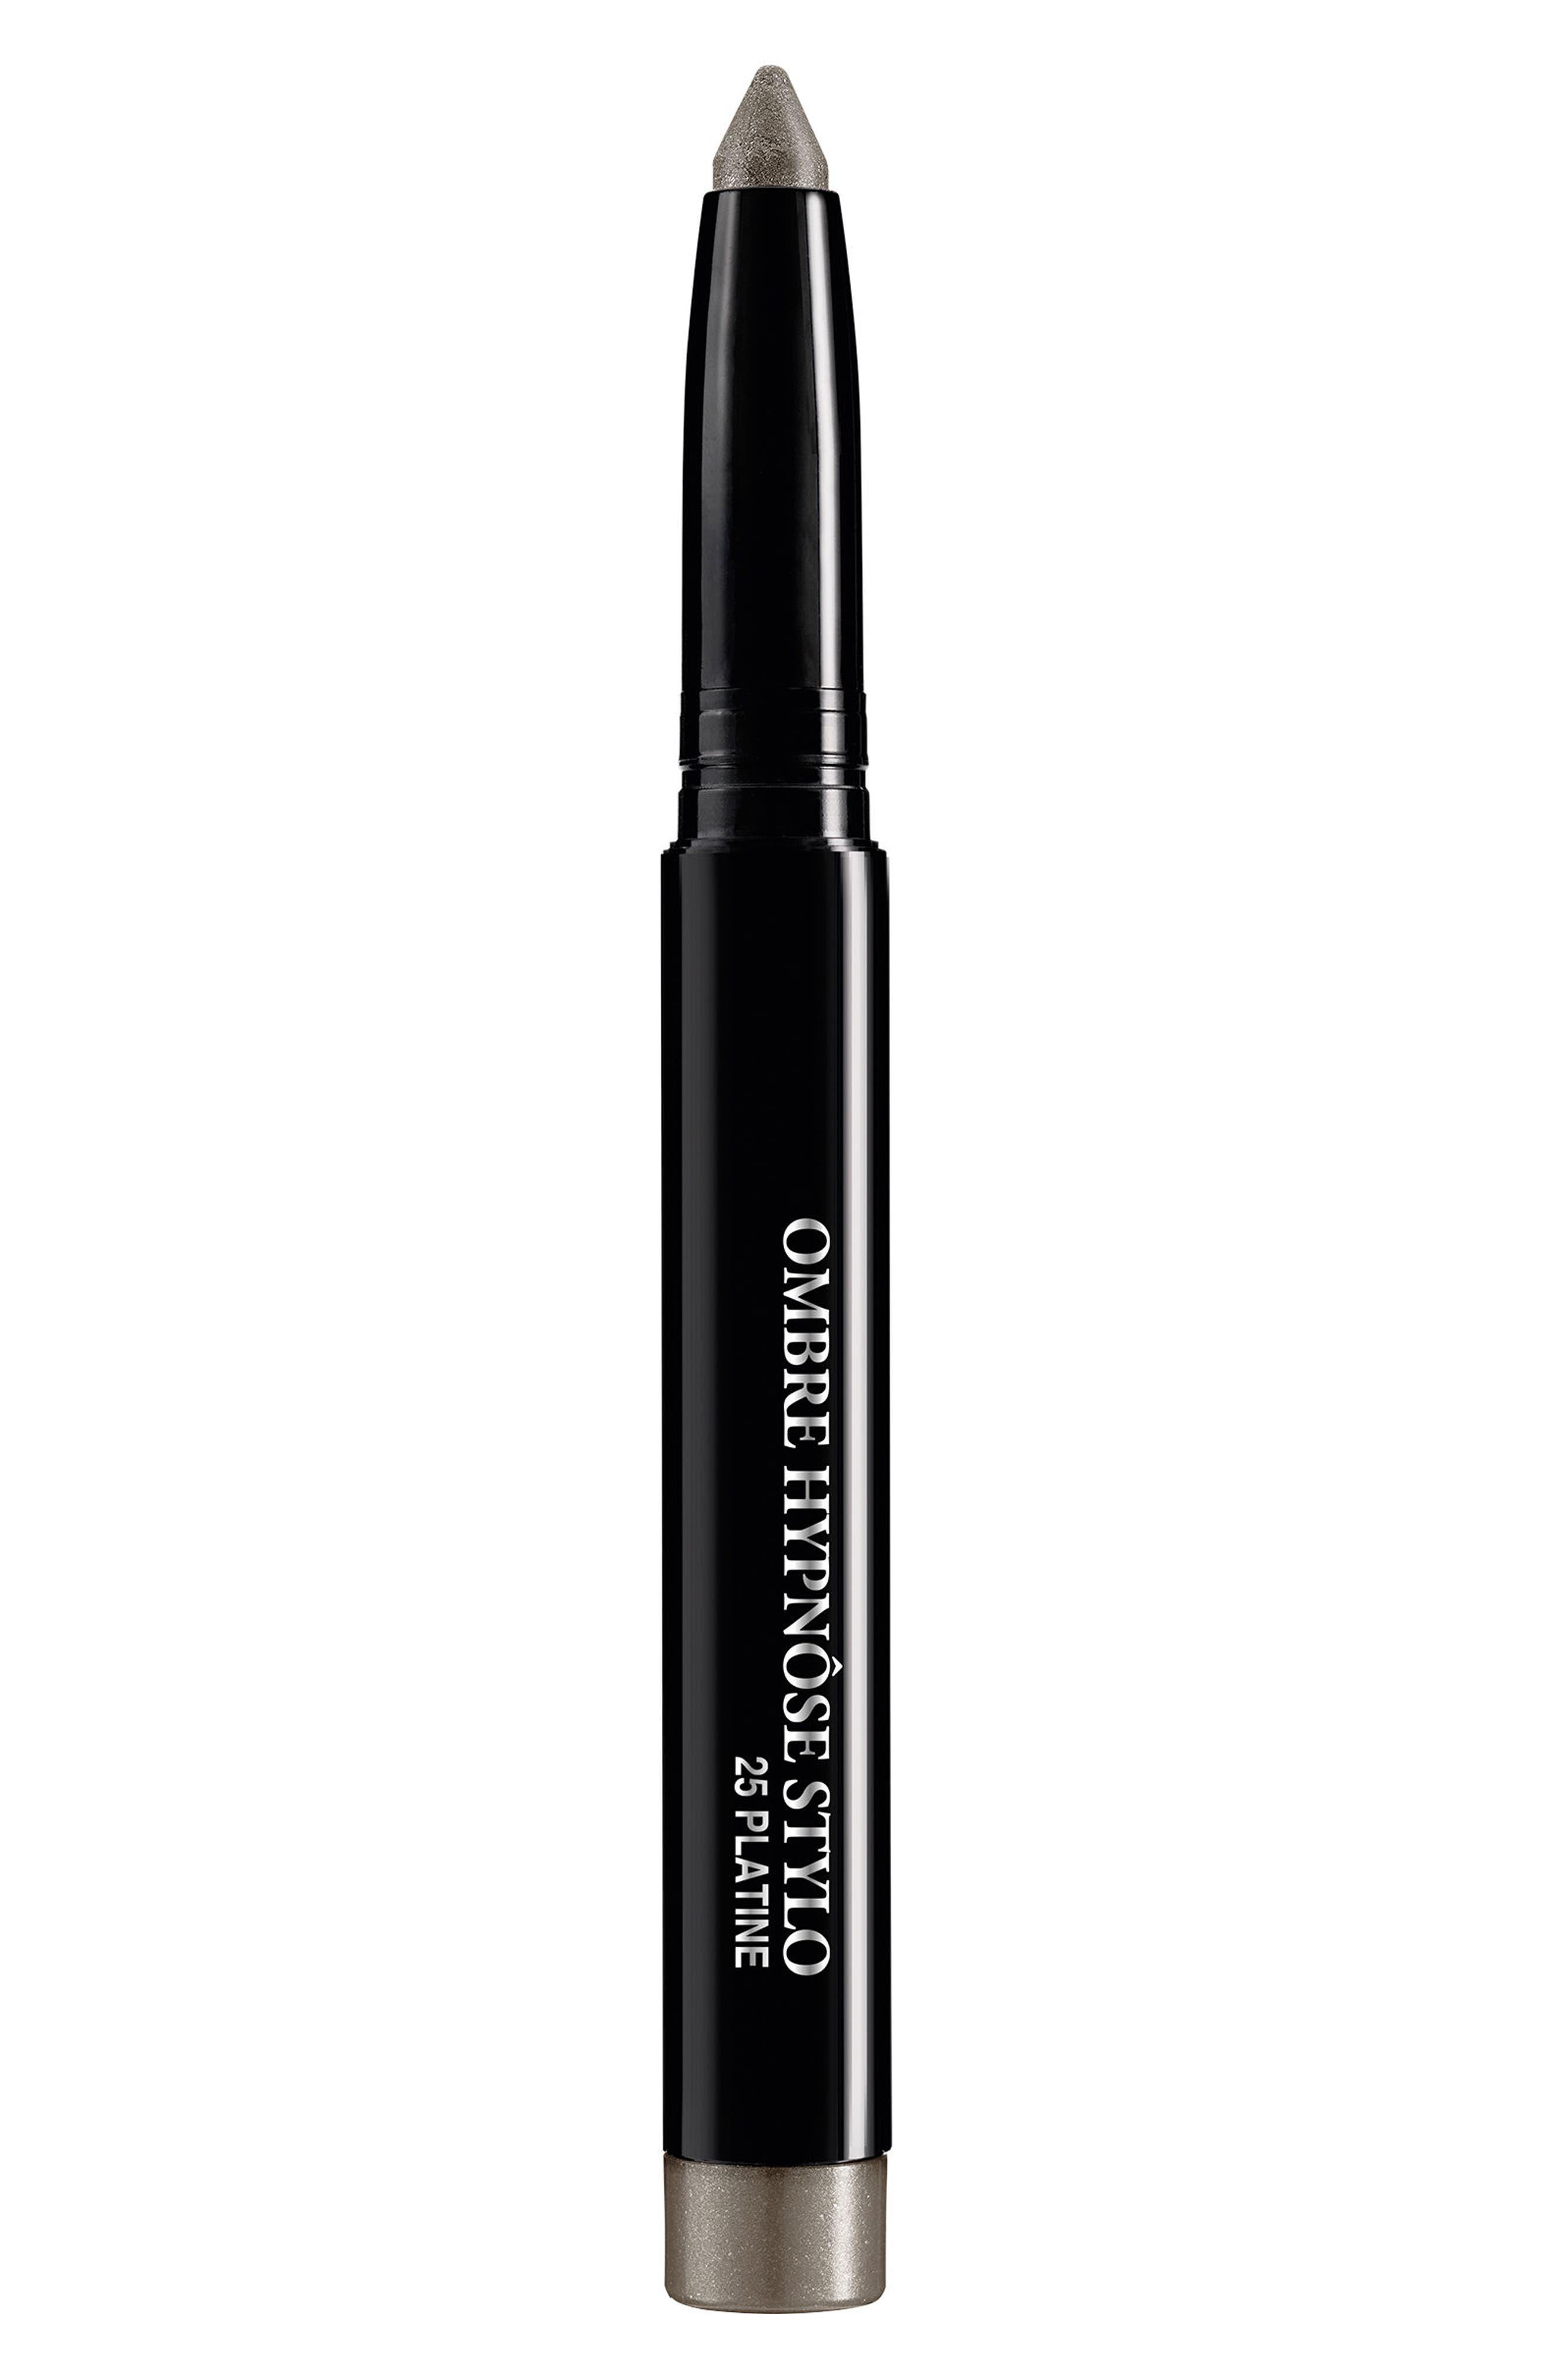 Lancôme 'Ombre Hypnôse Stylo' Eyeshadow